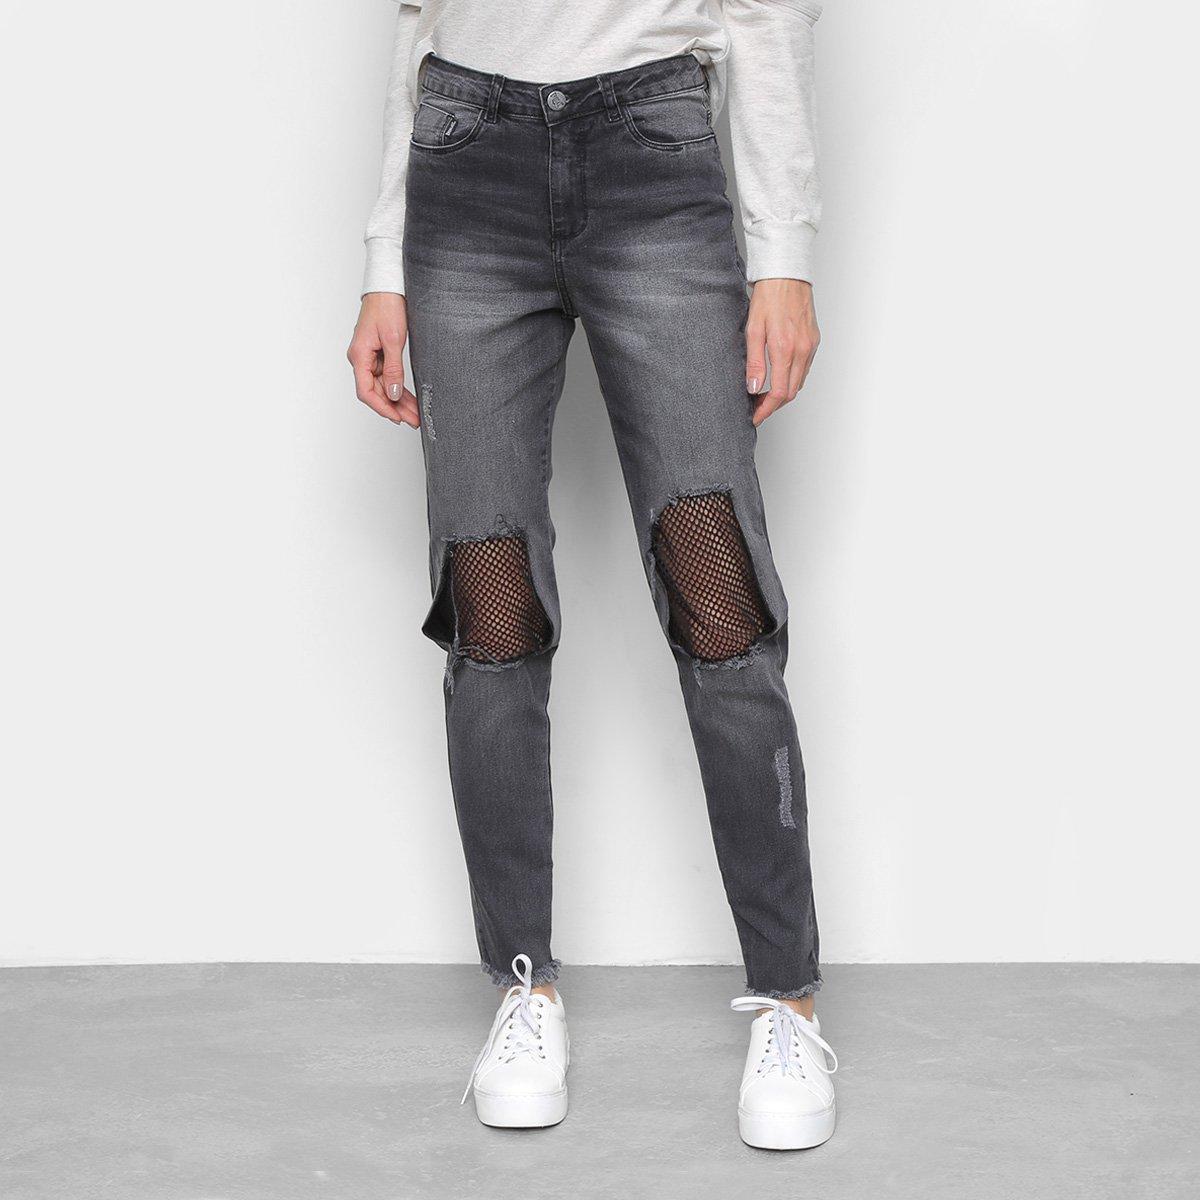 Calça Jeans Everlast Boyfriend Tela Feminina